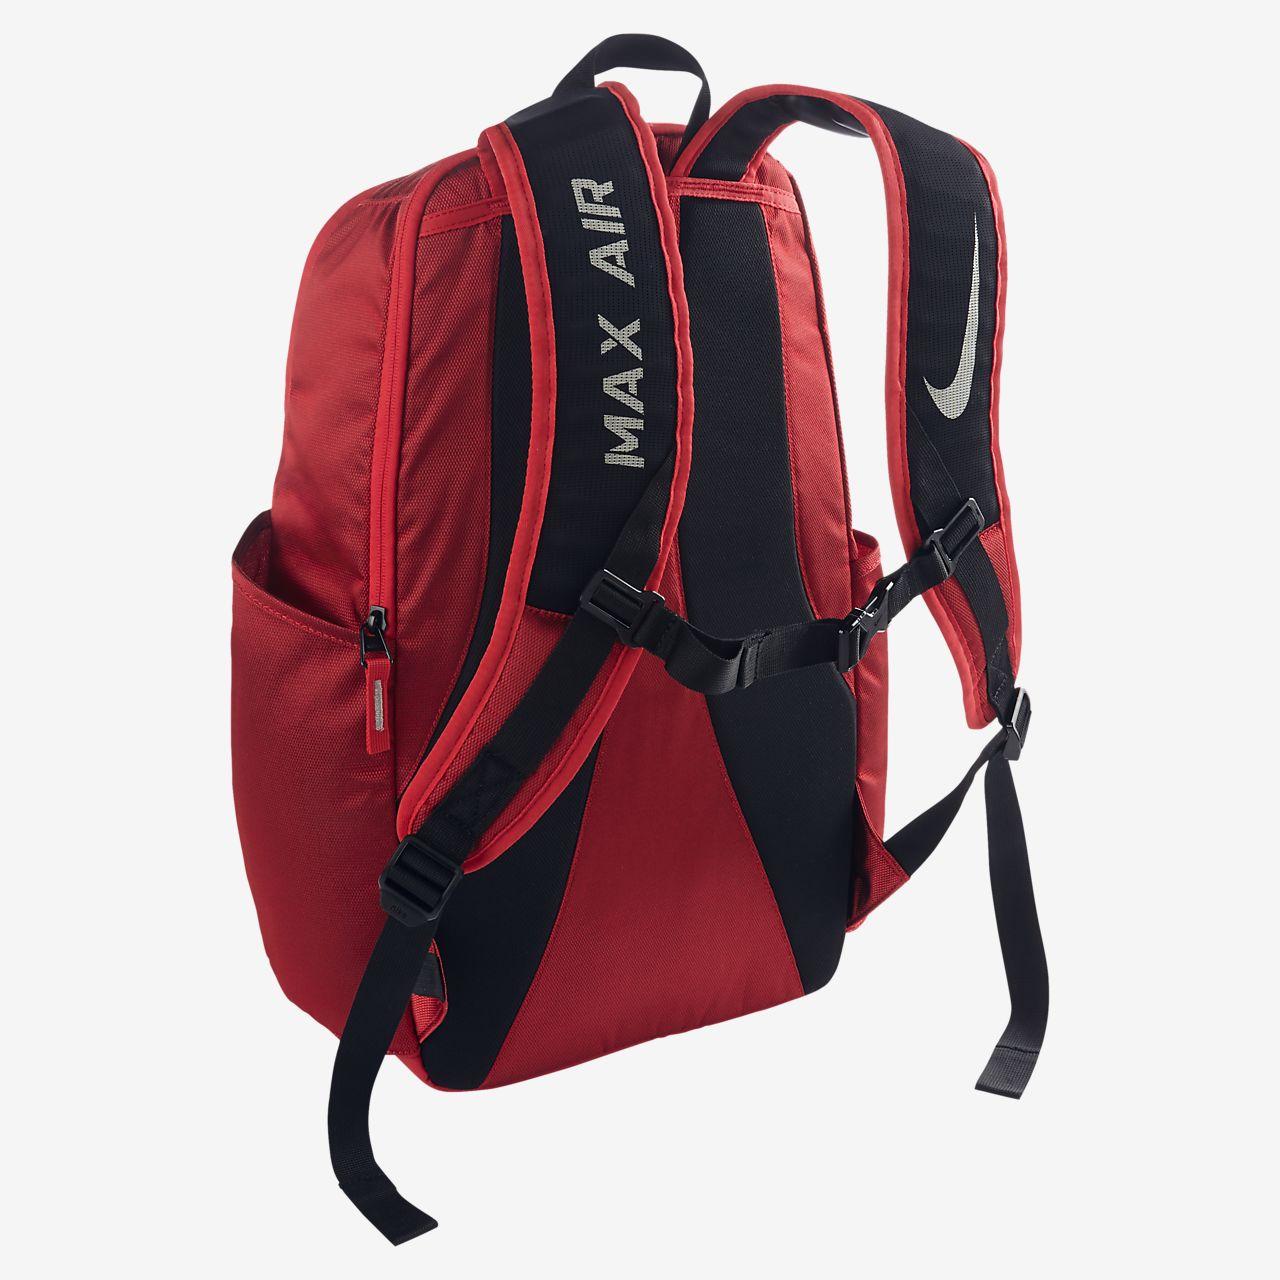 new arrival ad1aa fa204 nike vapor max backpack